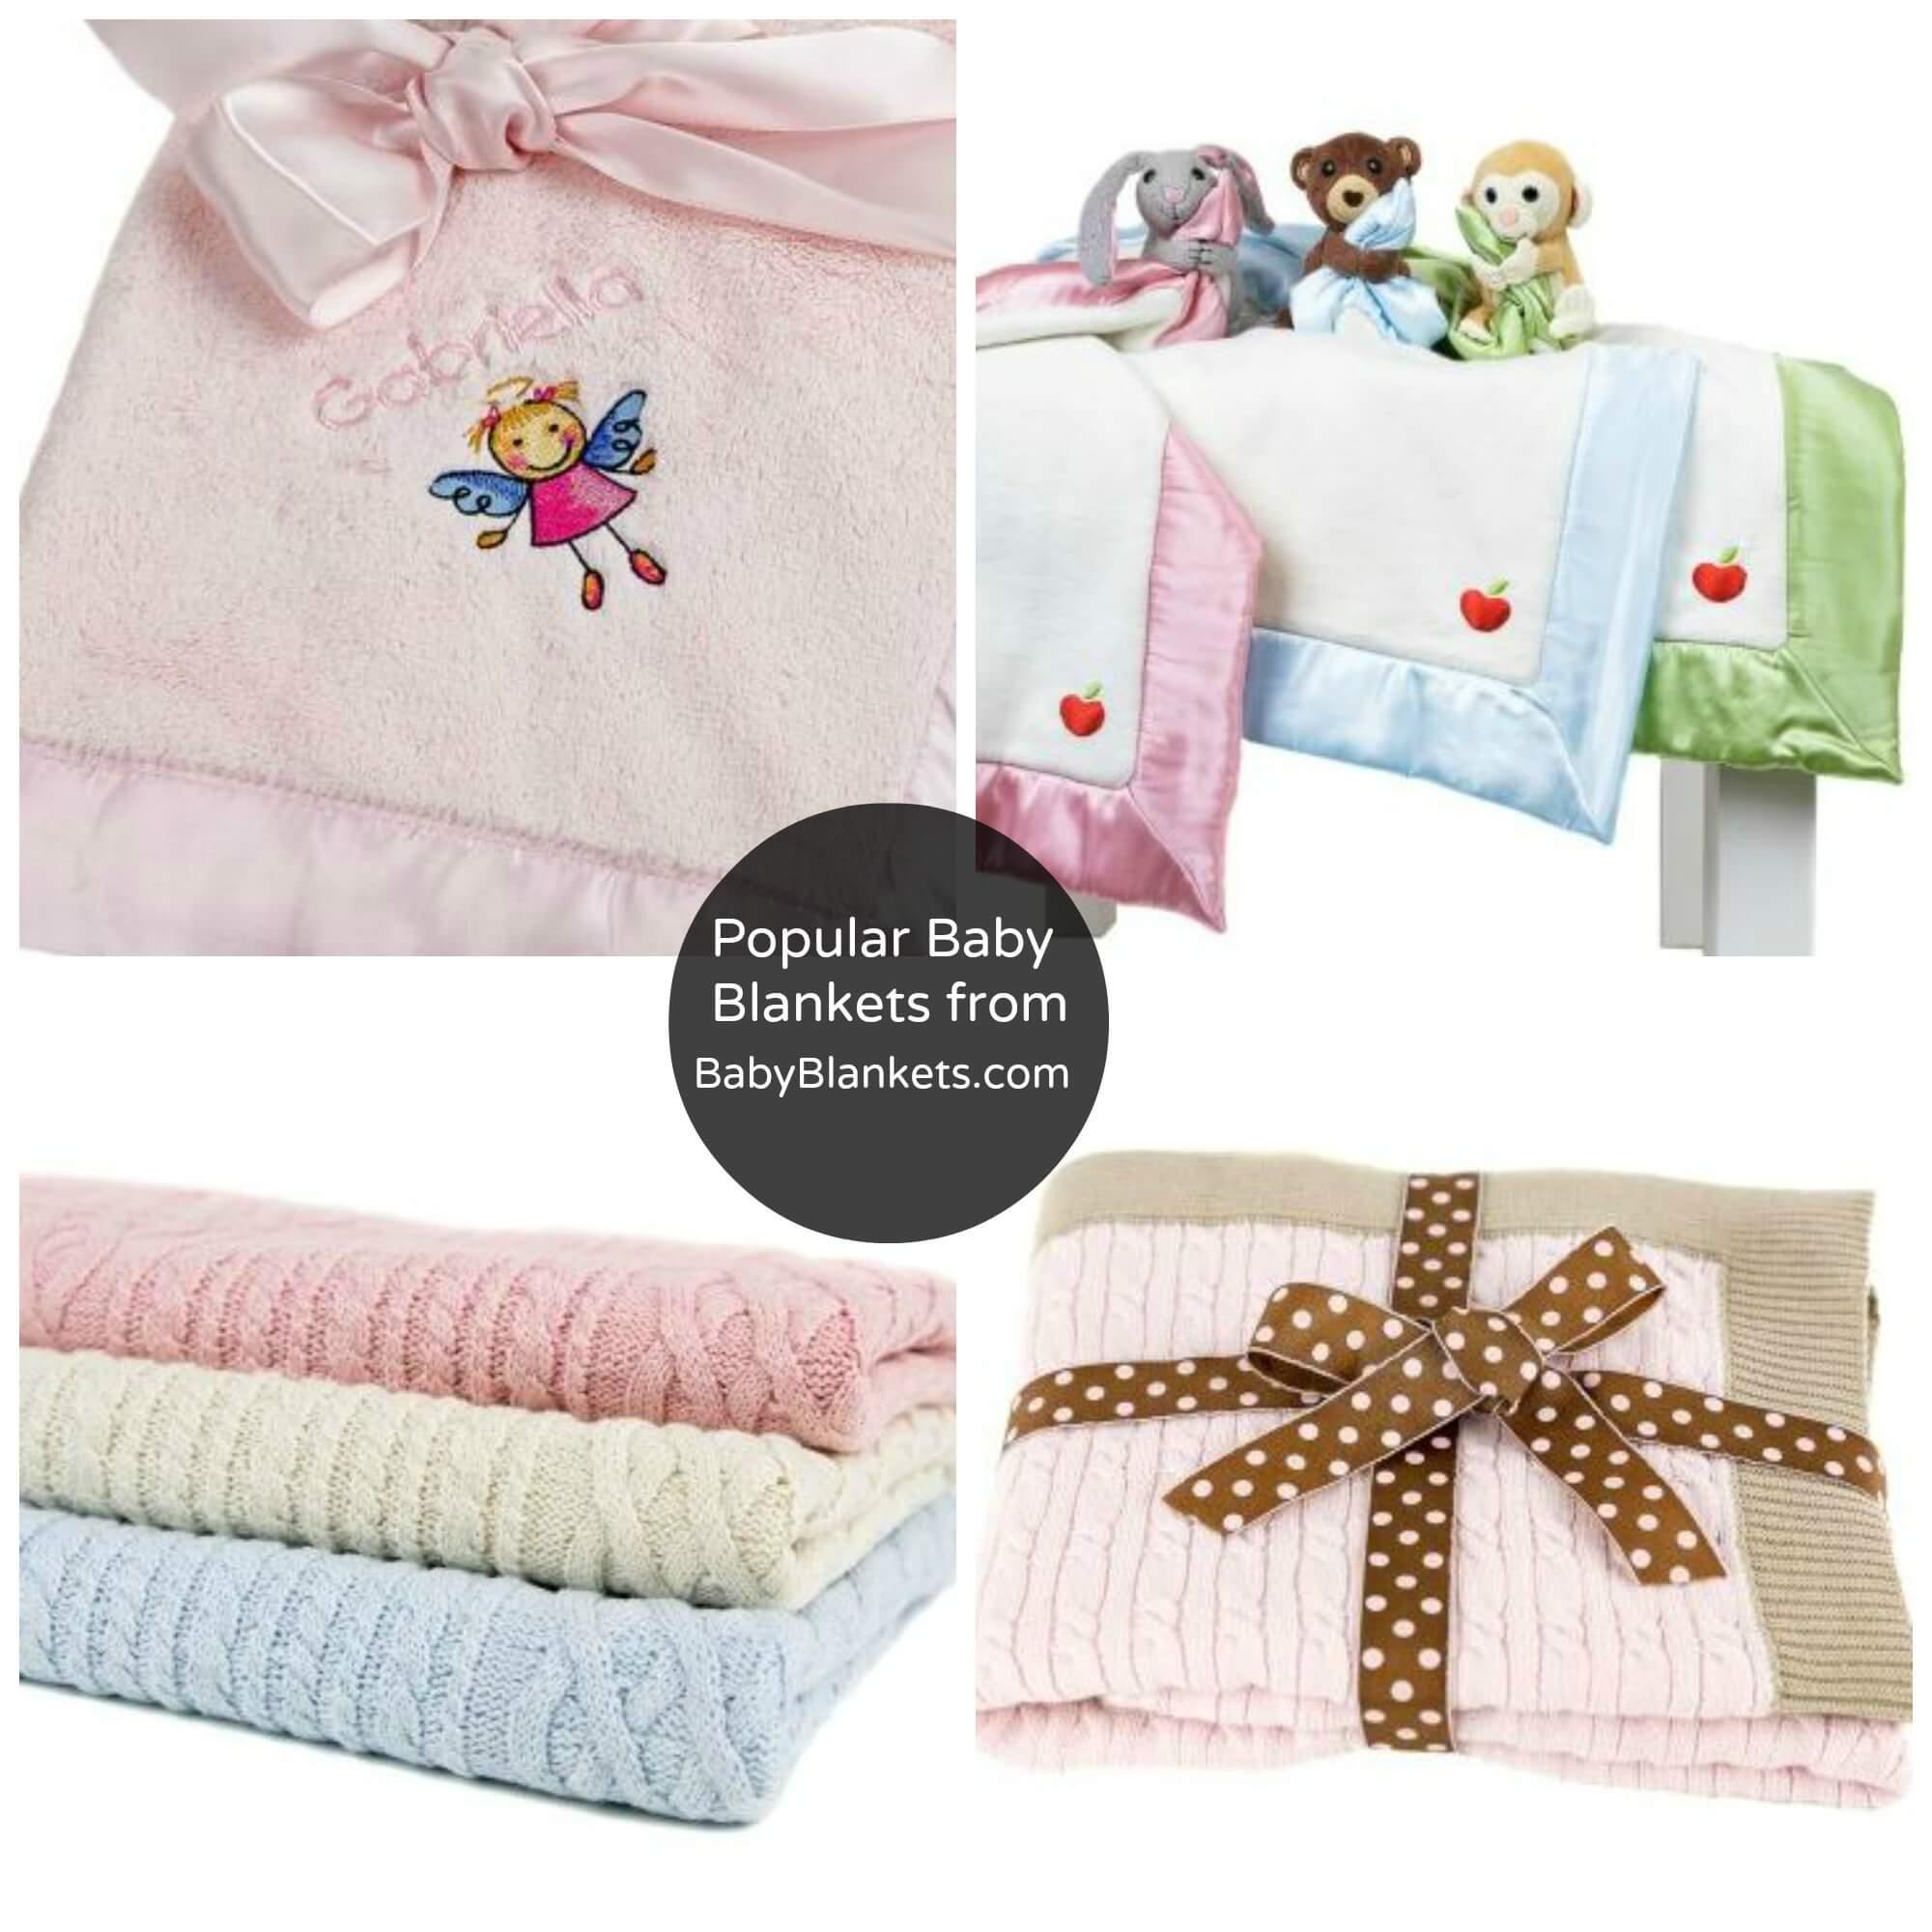 Popular Baby Blankets